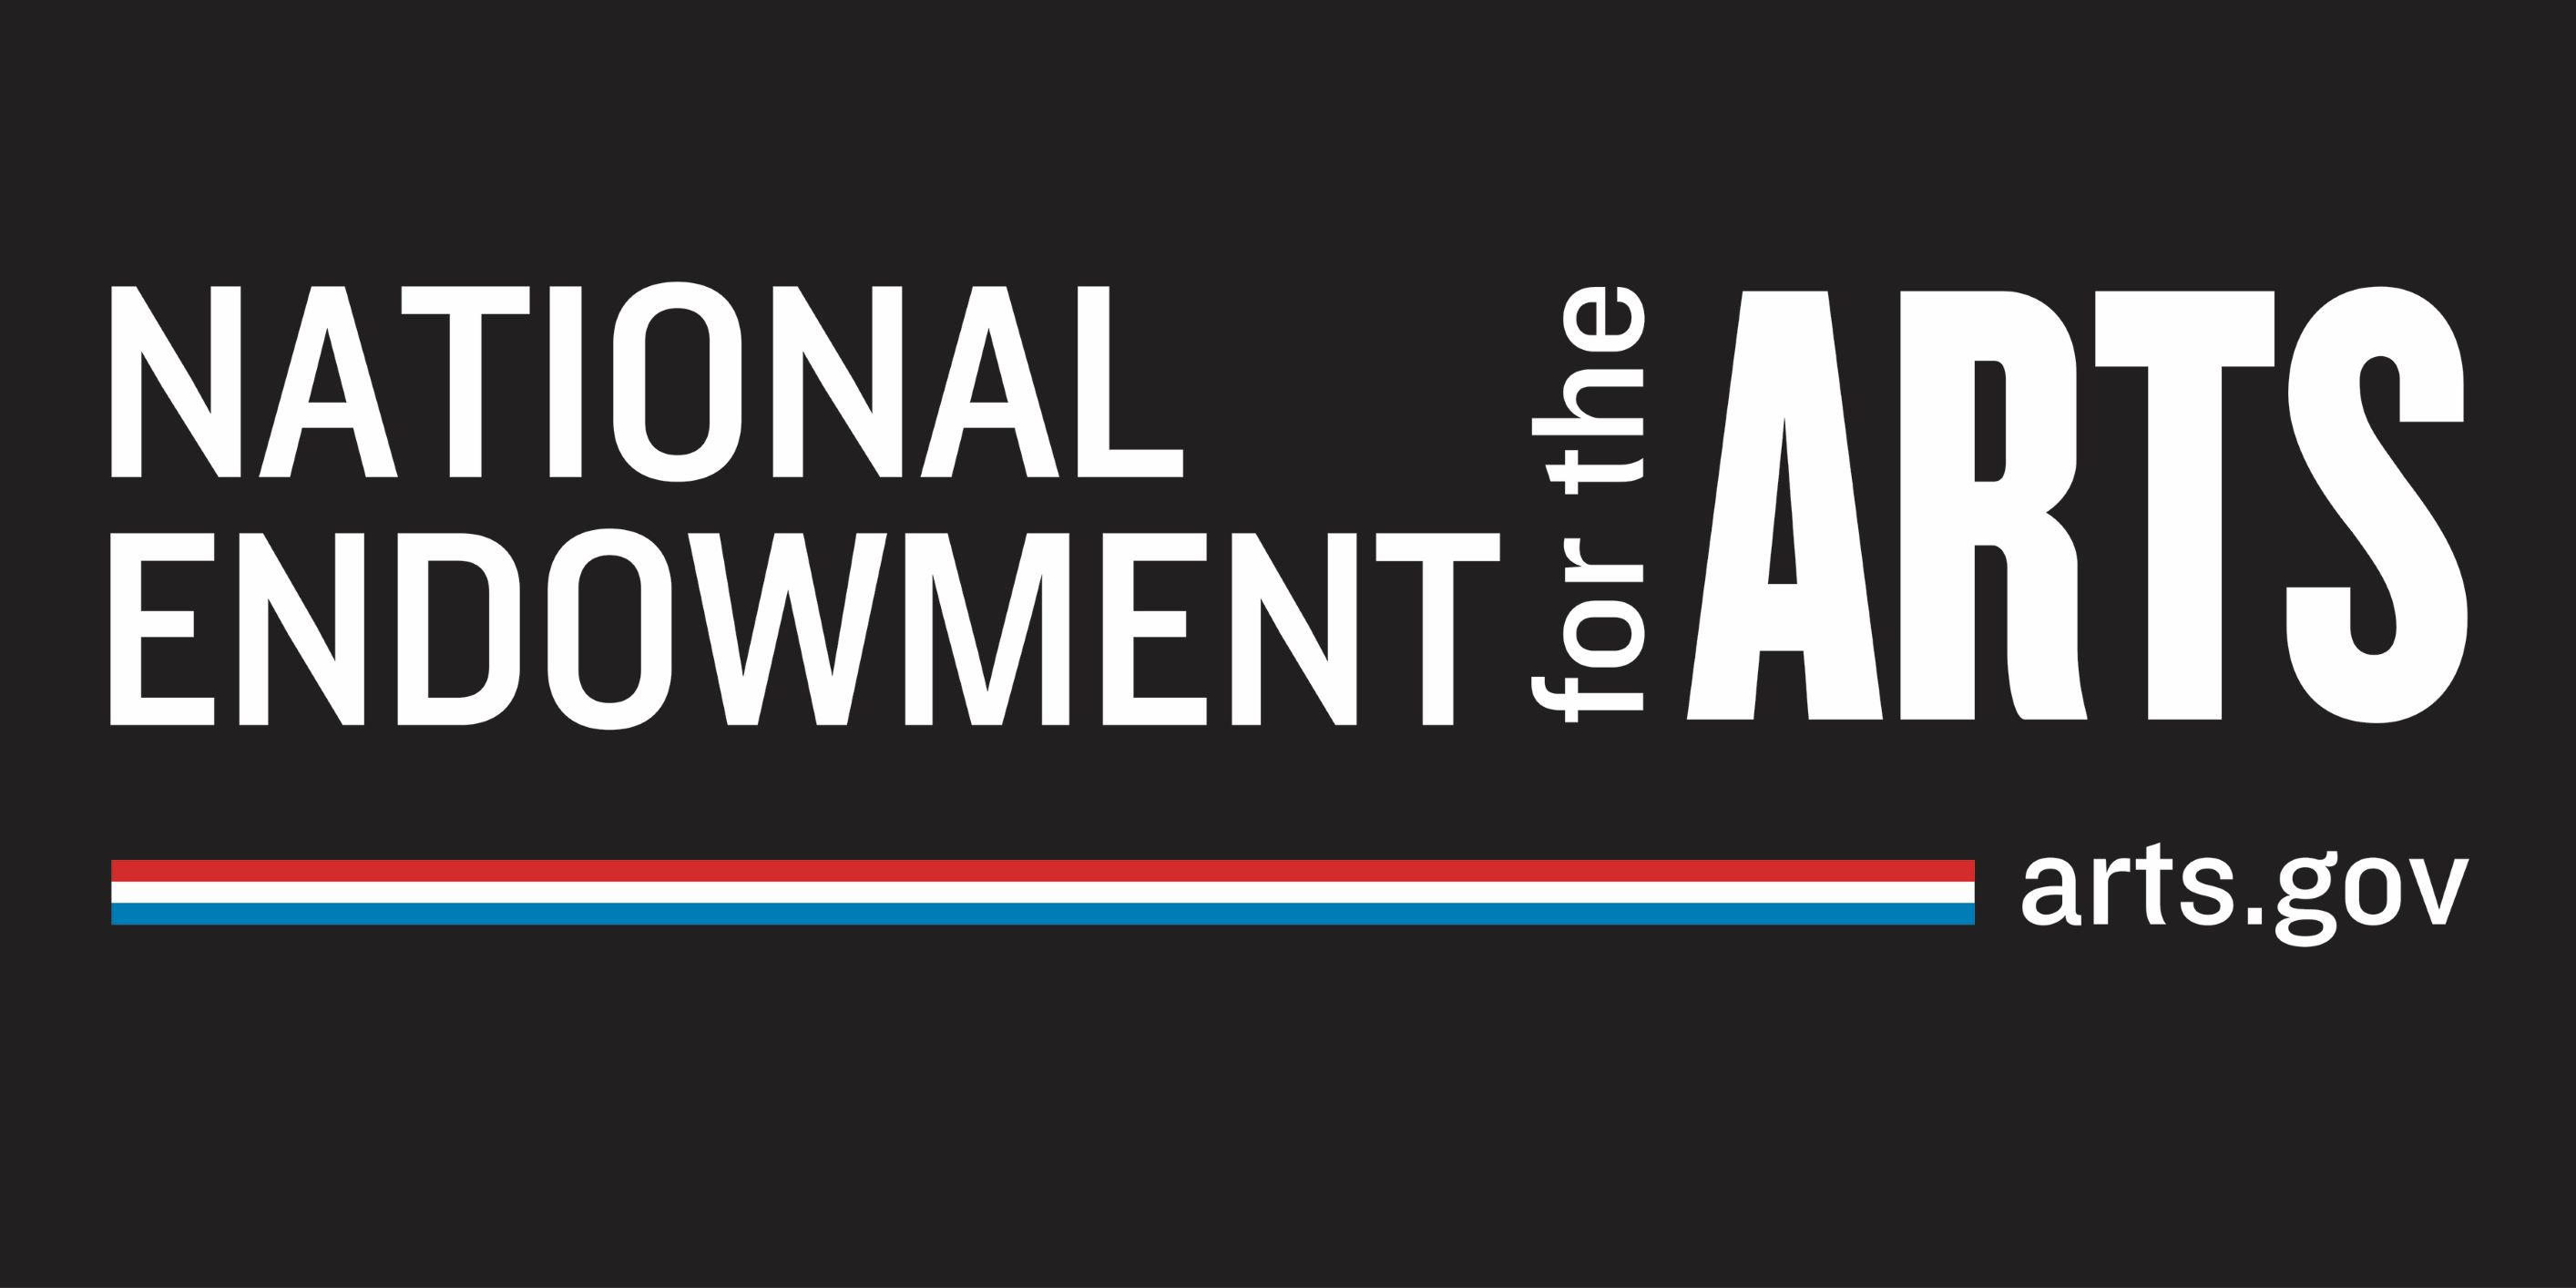 Ohio Folk & Traditional Arts - National Endowment for the Arts